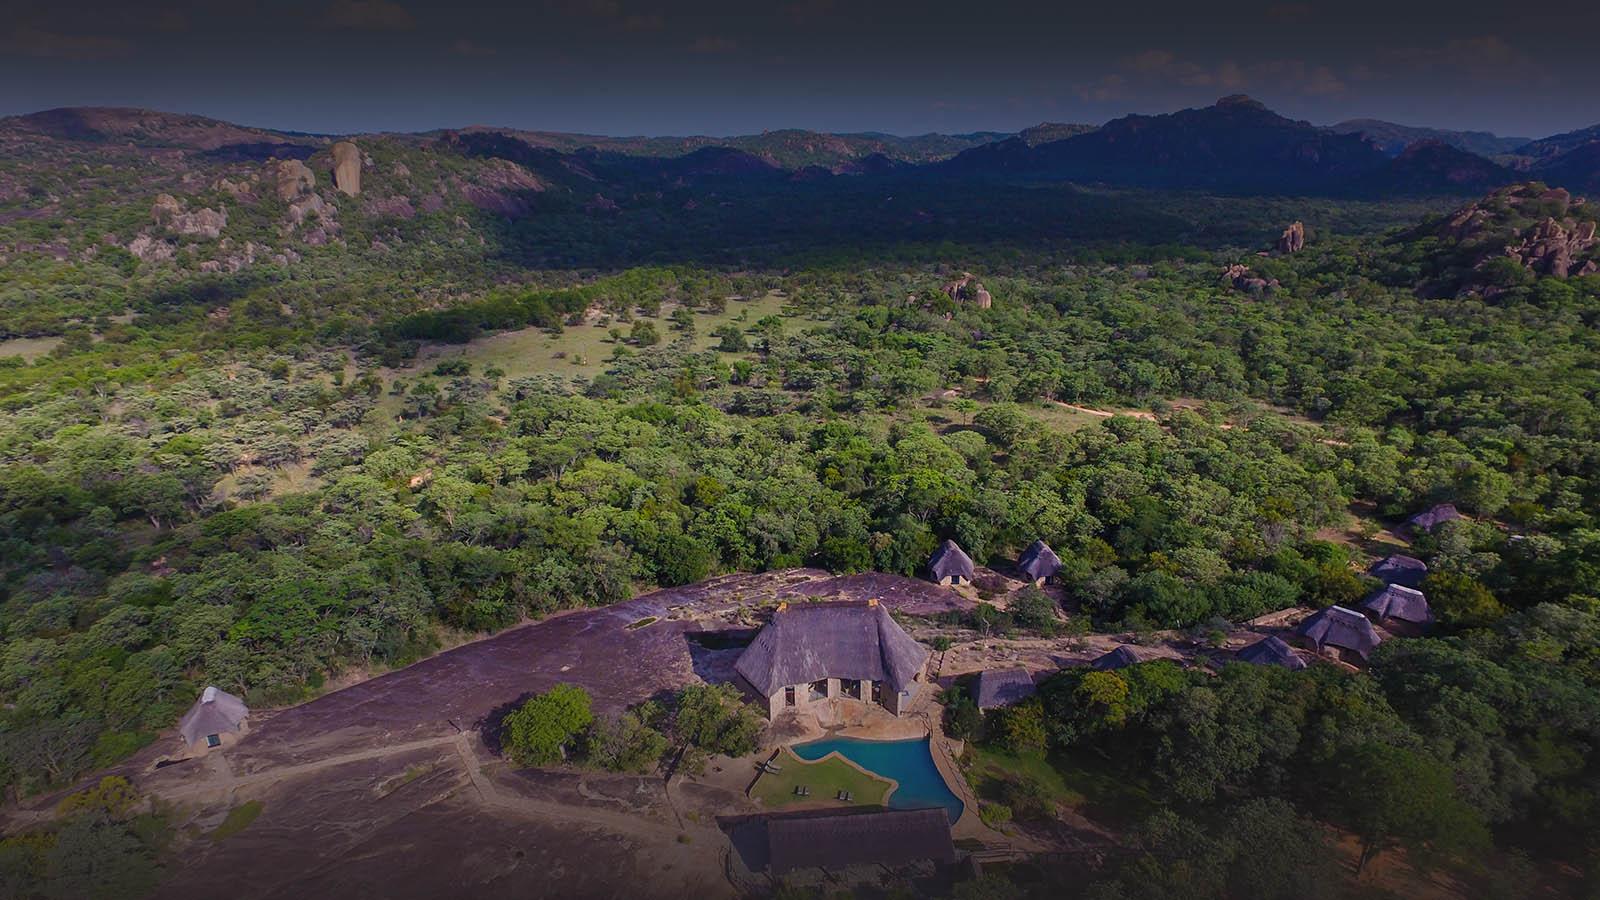 matobo hills lodge-zimbabwe-lodges-accommodation-matopos-matobo-national-park-hills